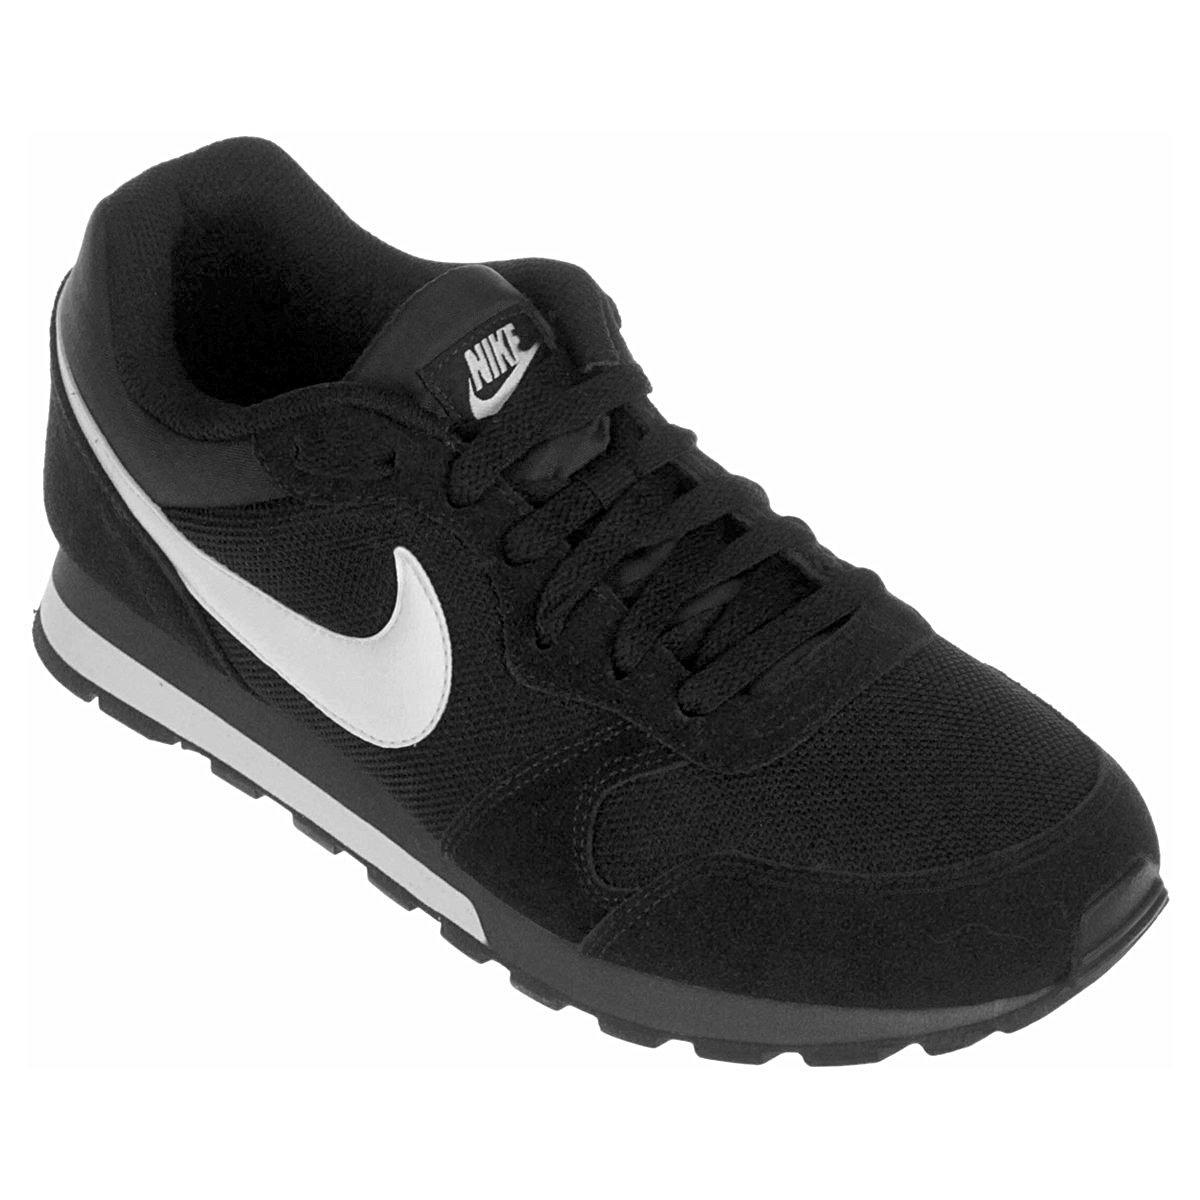 a9dcf21d3d709 Tênis Nike Md Runner 2 Masculino - Preto e Branco - Compre Agora ...